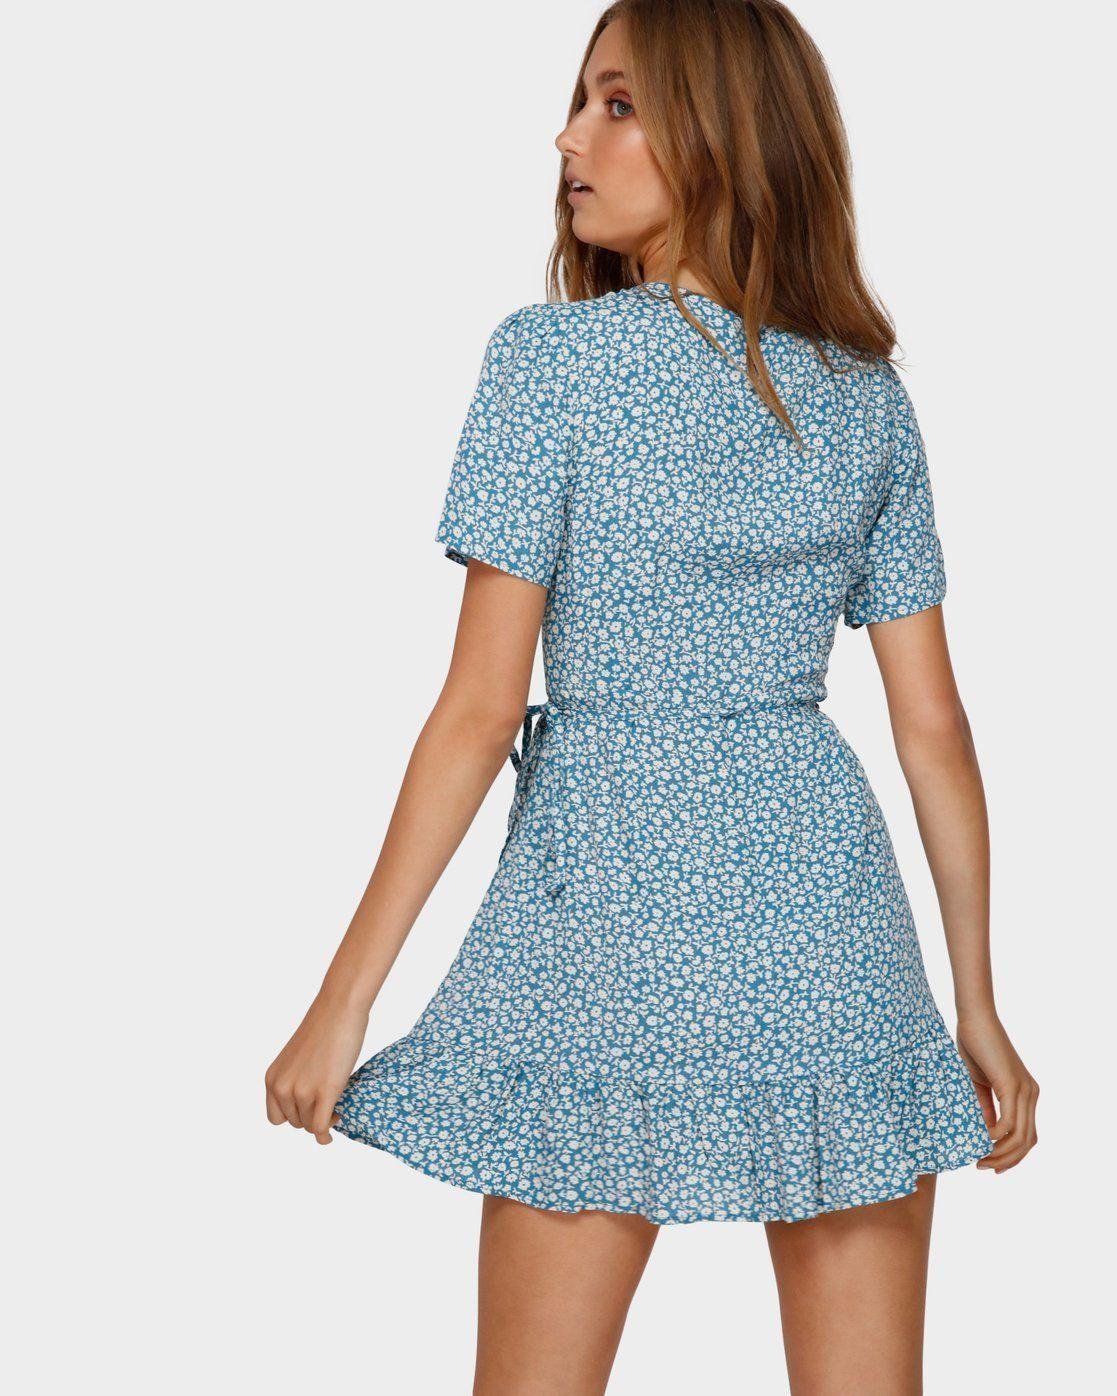 Florida Wrap Dress Jd831bfl In 2020 Casual Summer Dresses Casual Dresses For Women Short Dresses Casual [ 1396 x 1117 Pixel ]